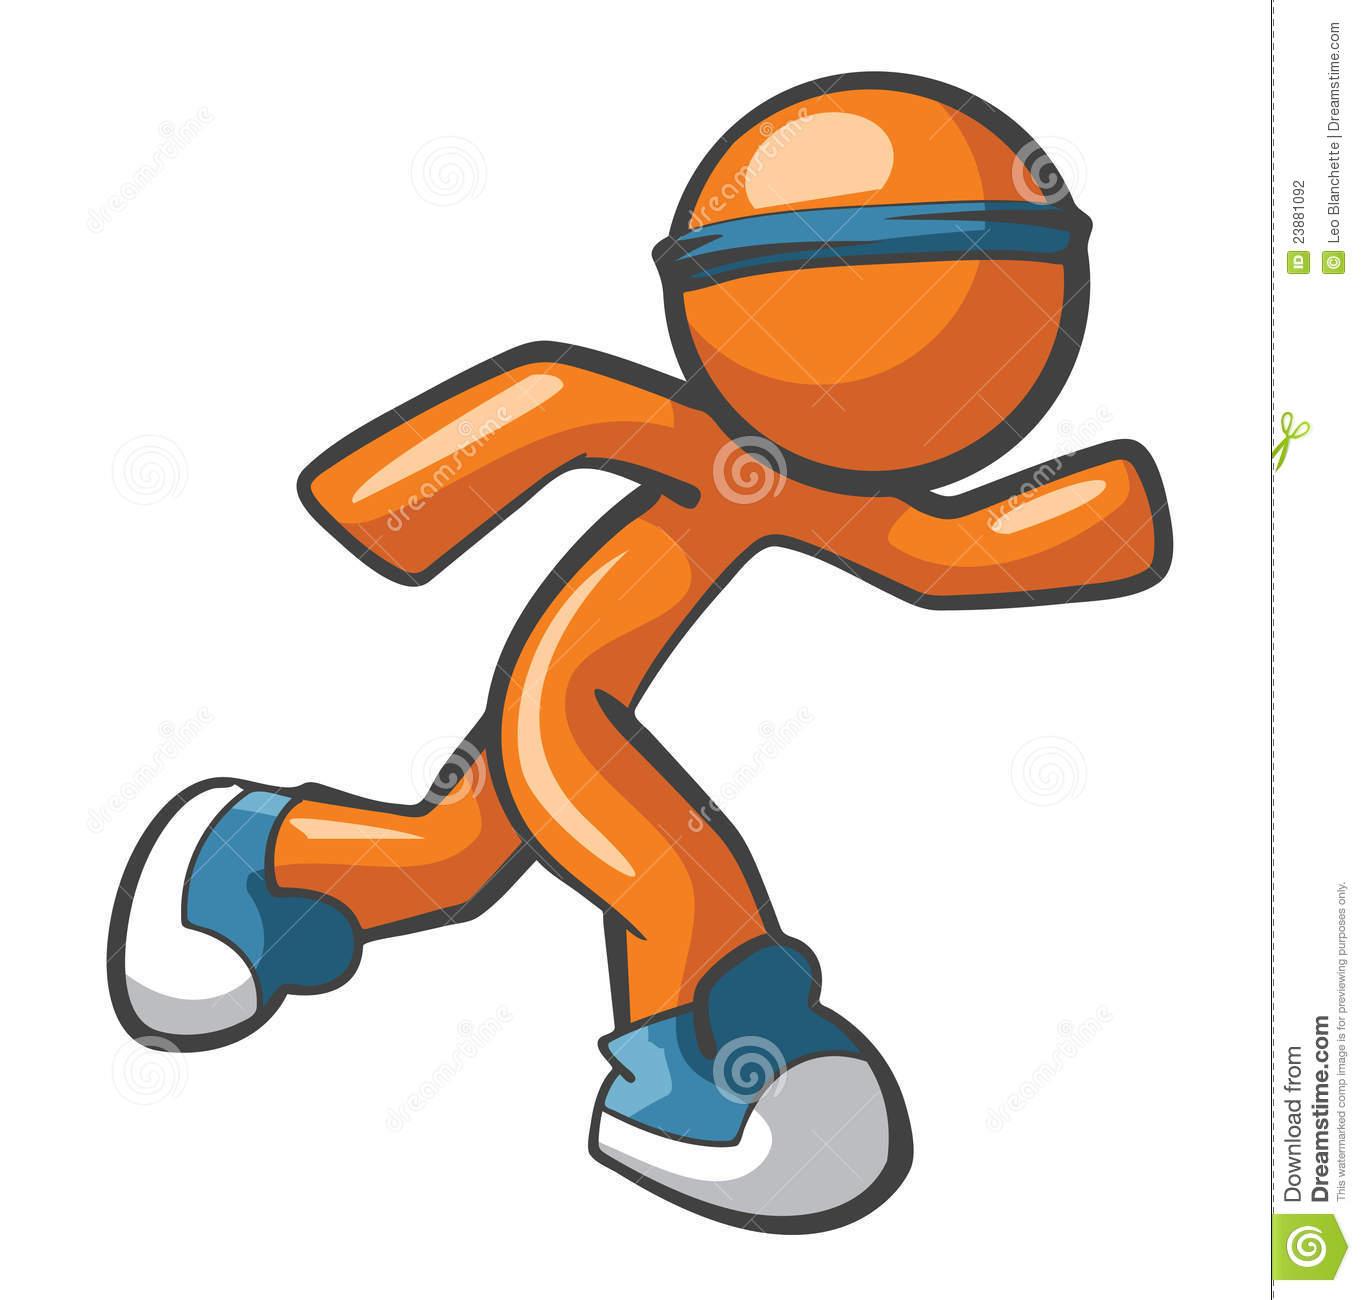 1361x1300 Sneakers Clipart Walking Foot